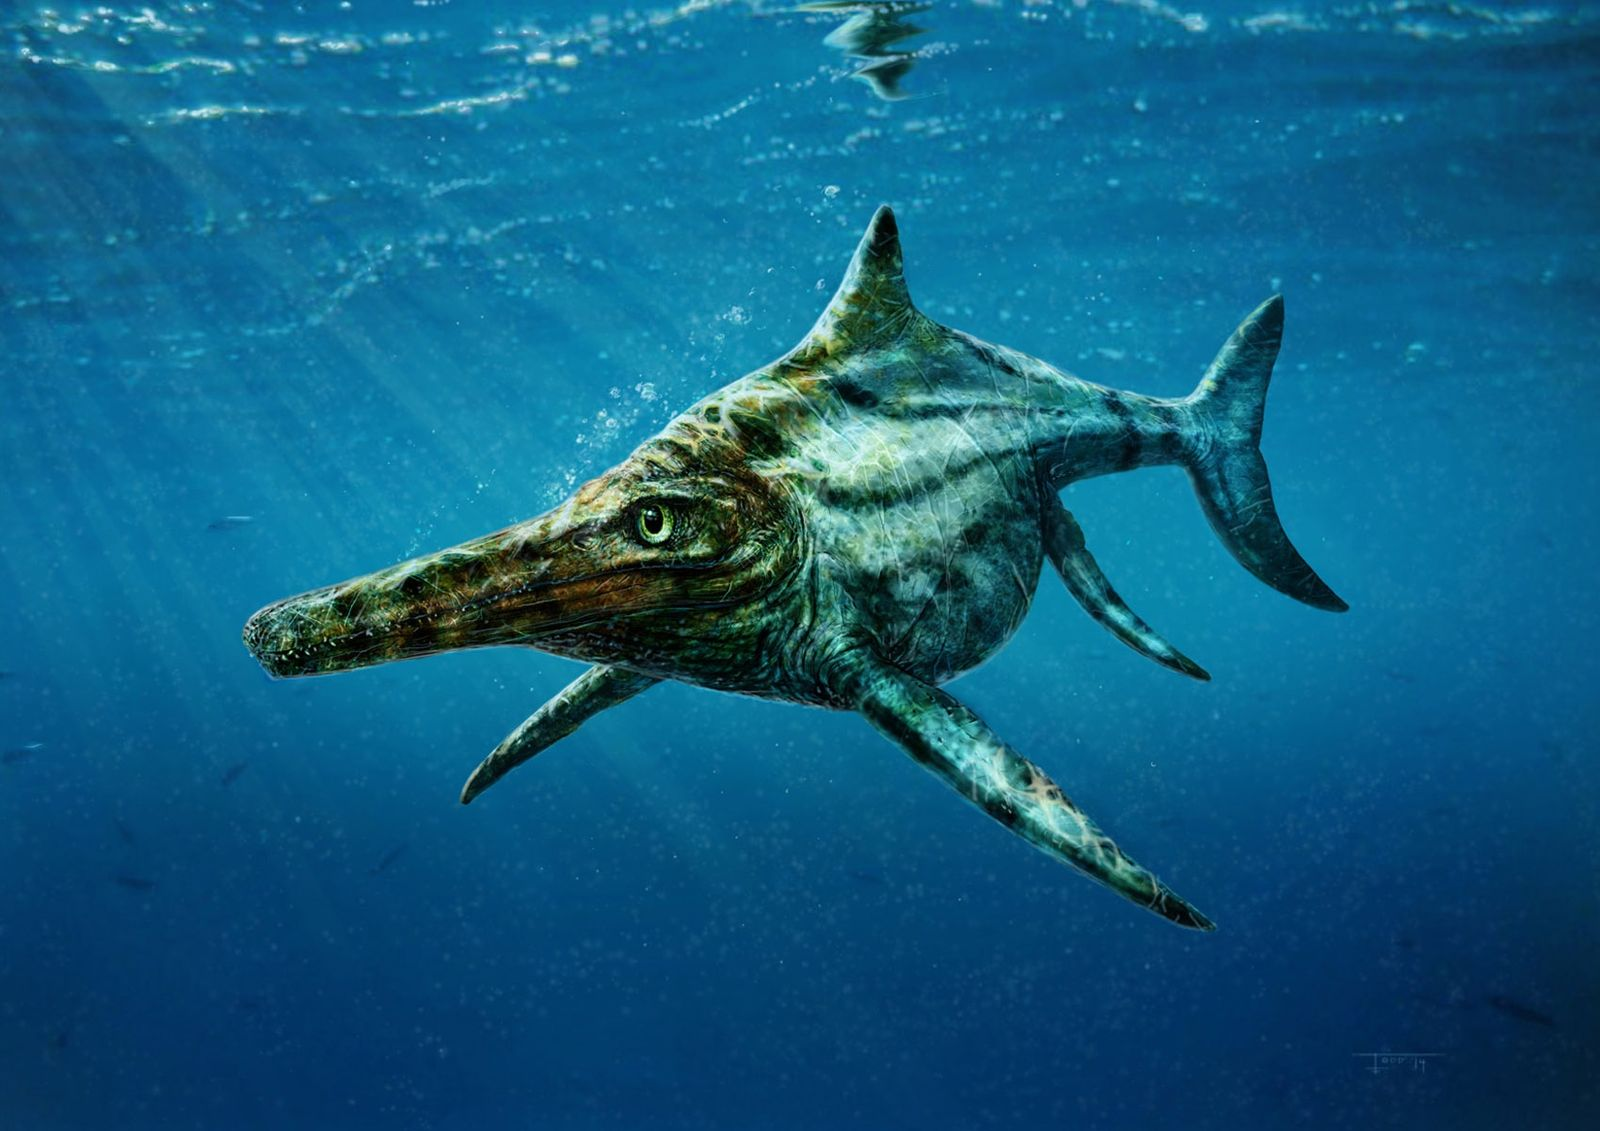 Meeresreptil / Ichthyosaurus